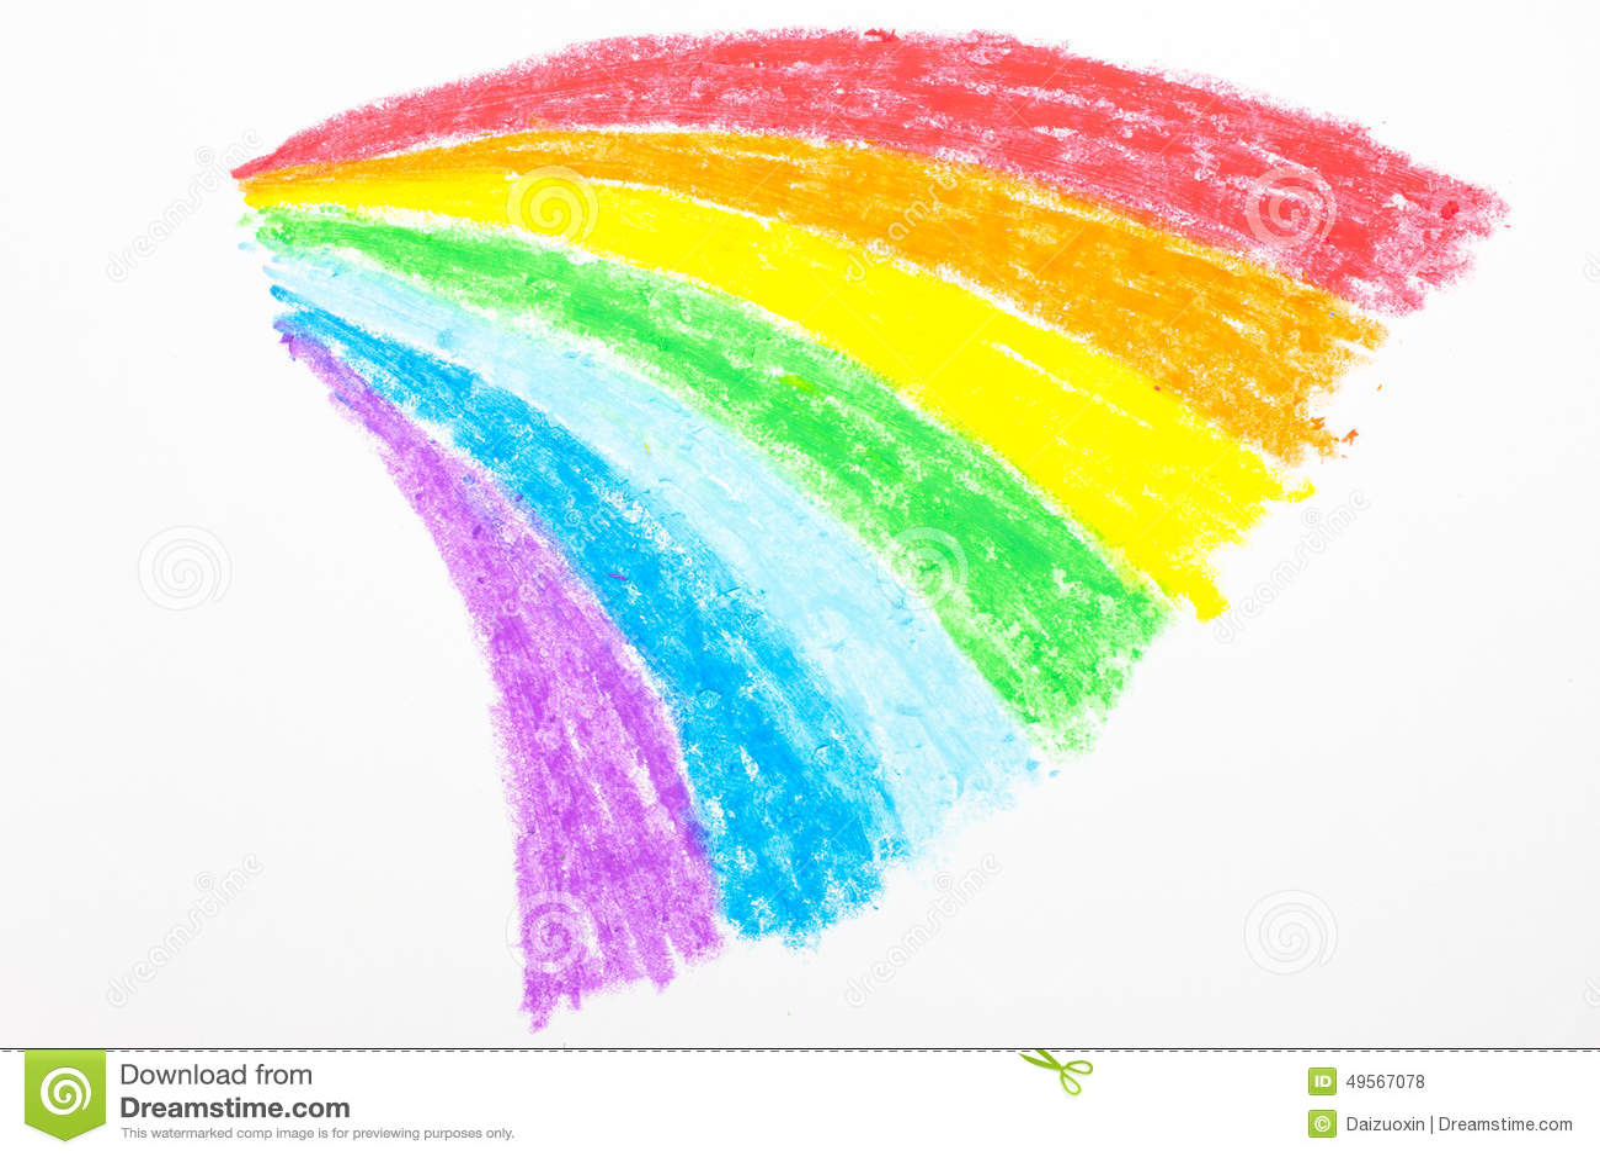 child s rainbow crayon drawing stock photo image of crayons